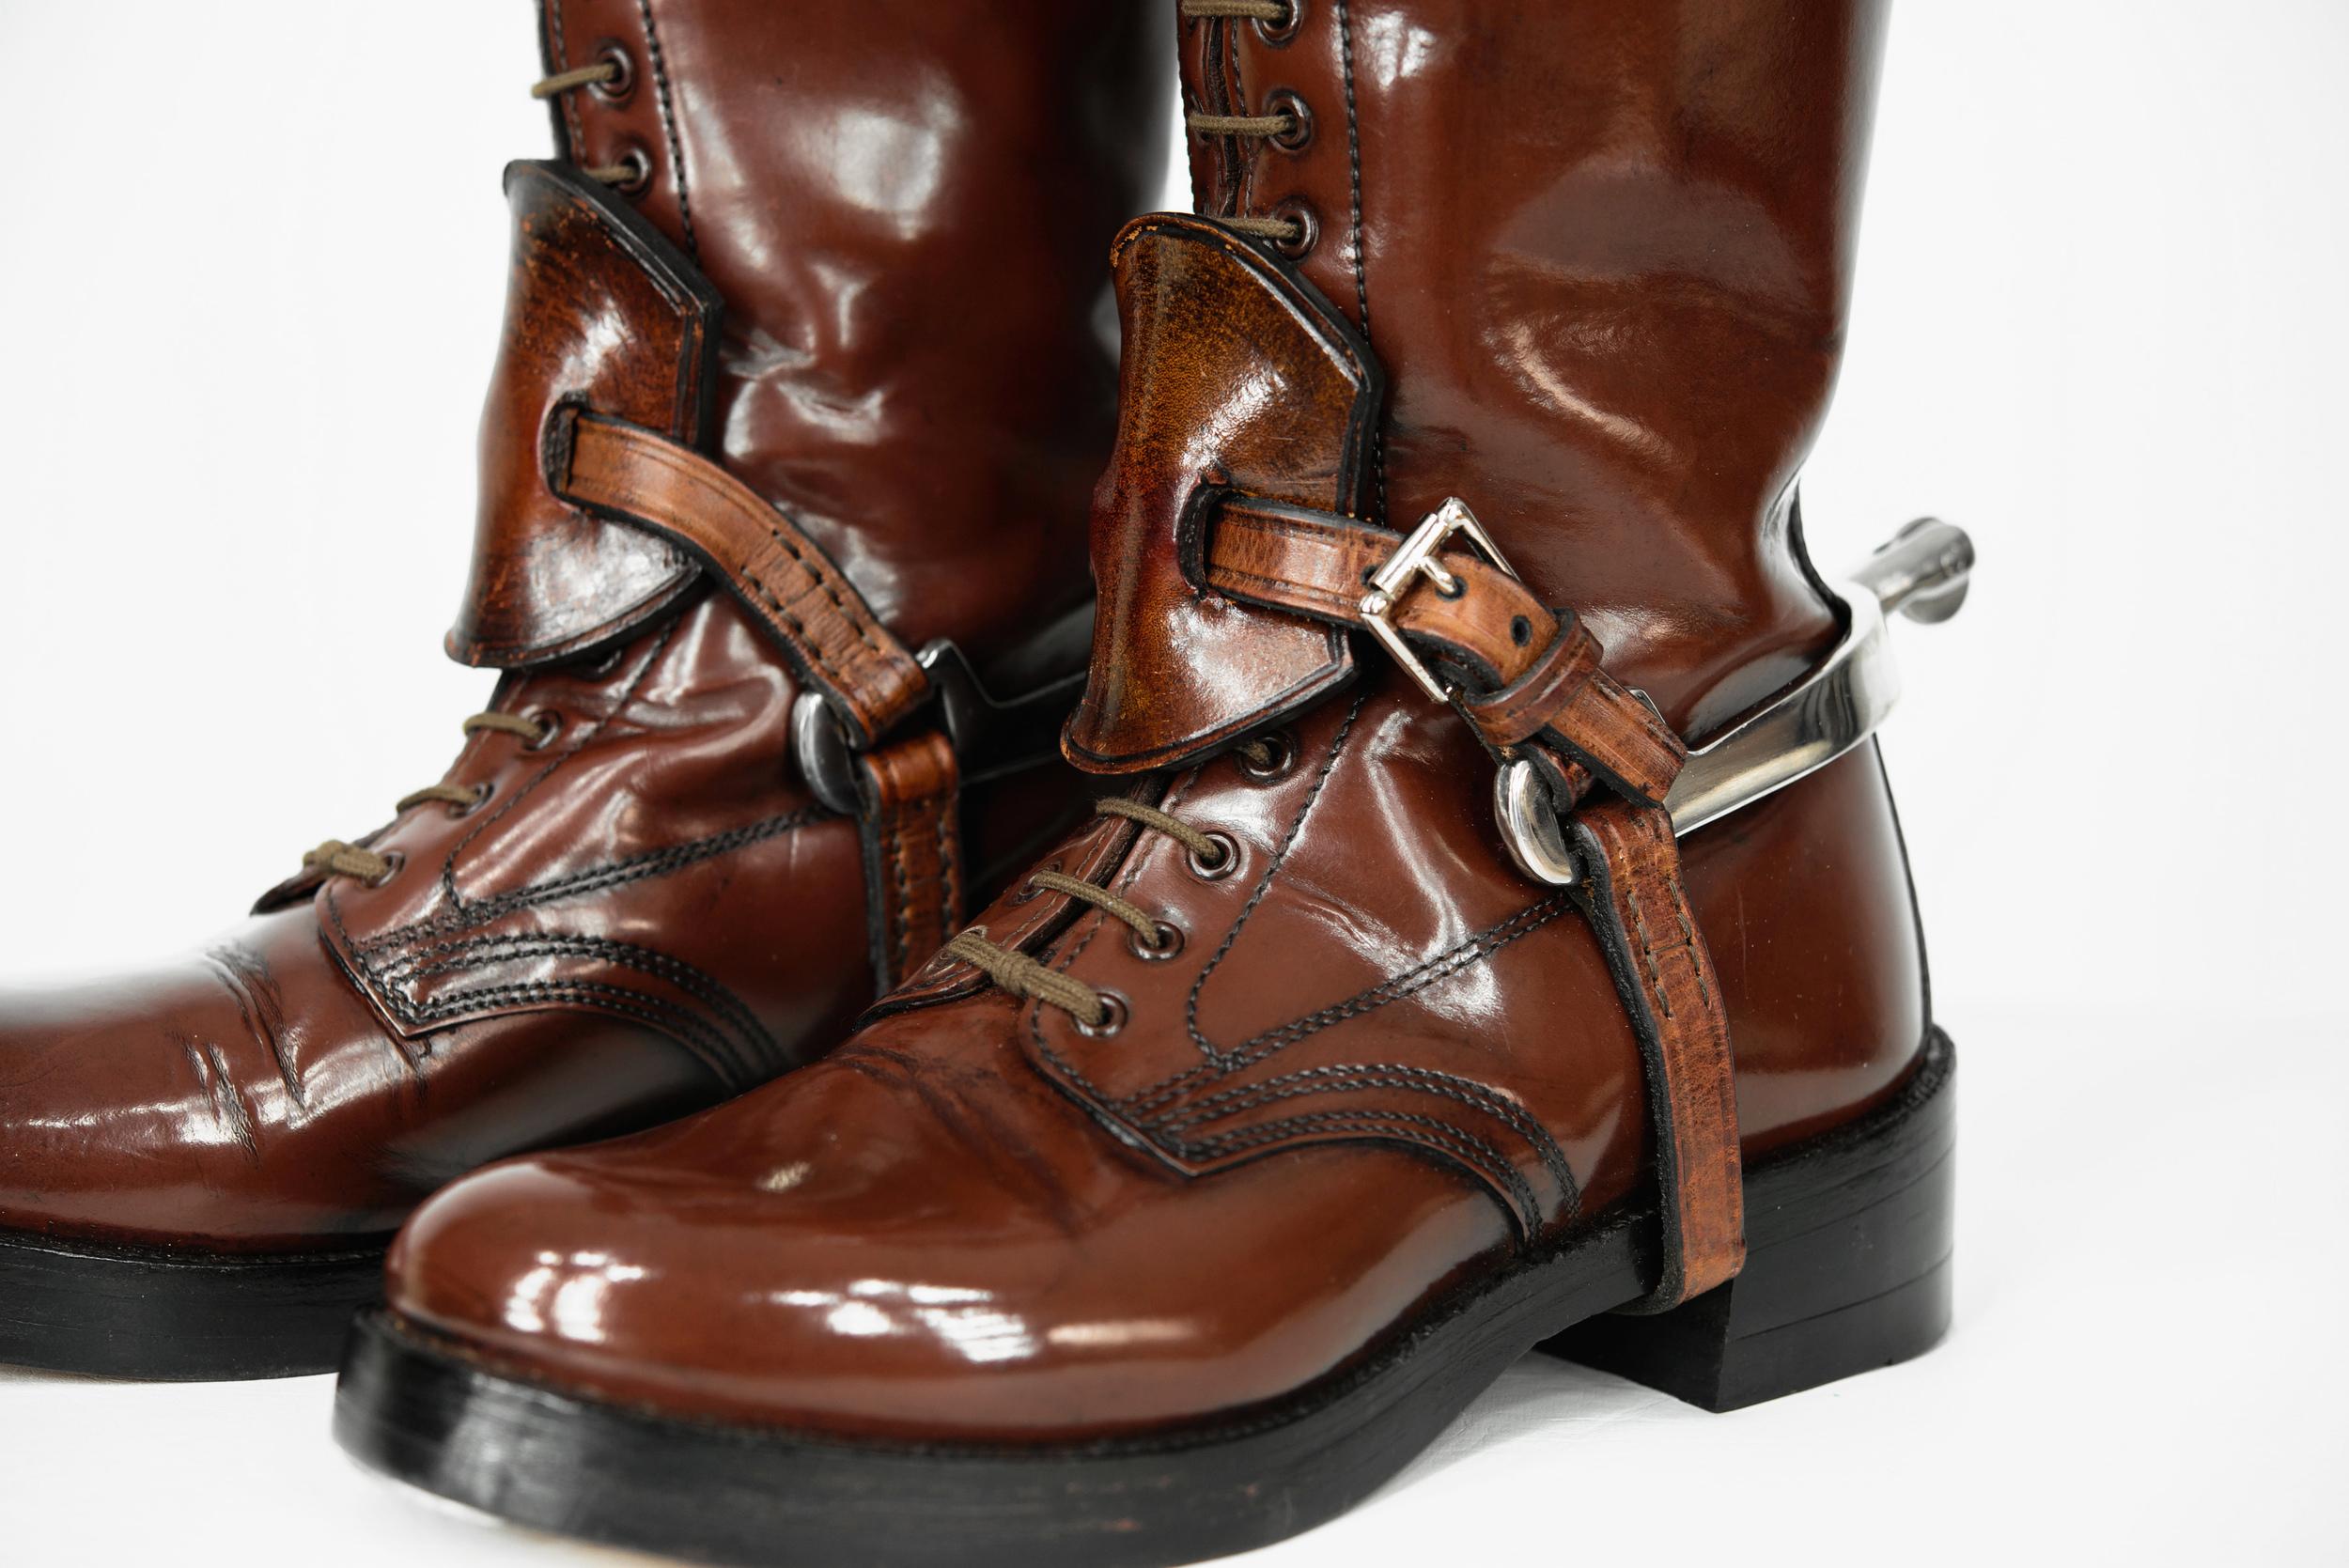 leathers-for-long-shank-spurs.jpg